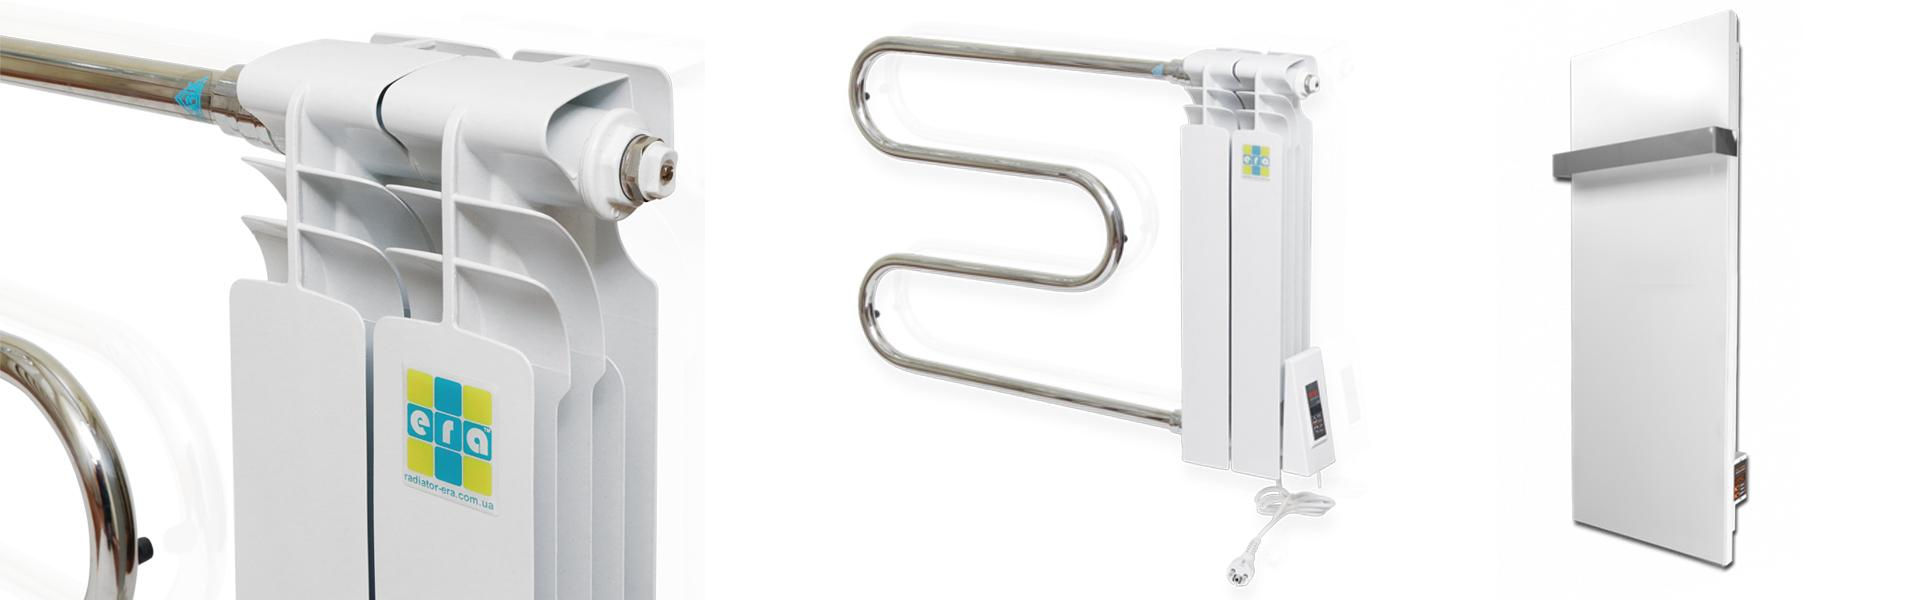 Электрополотенцесушители с терморегулятором ЭРА+